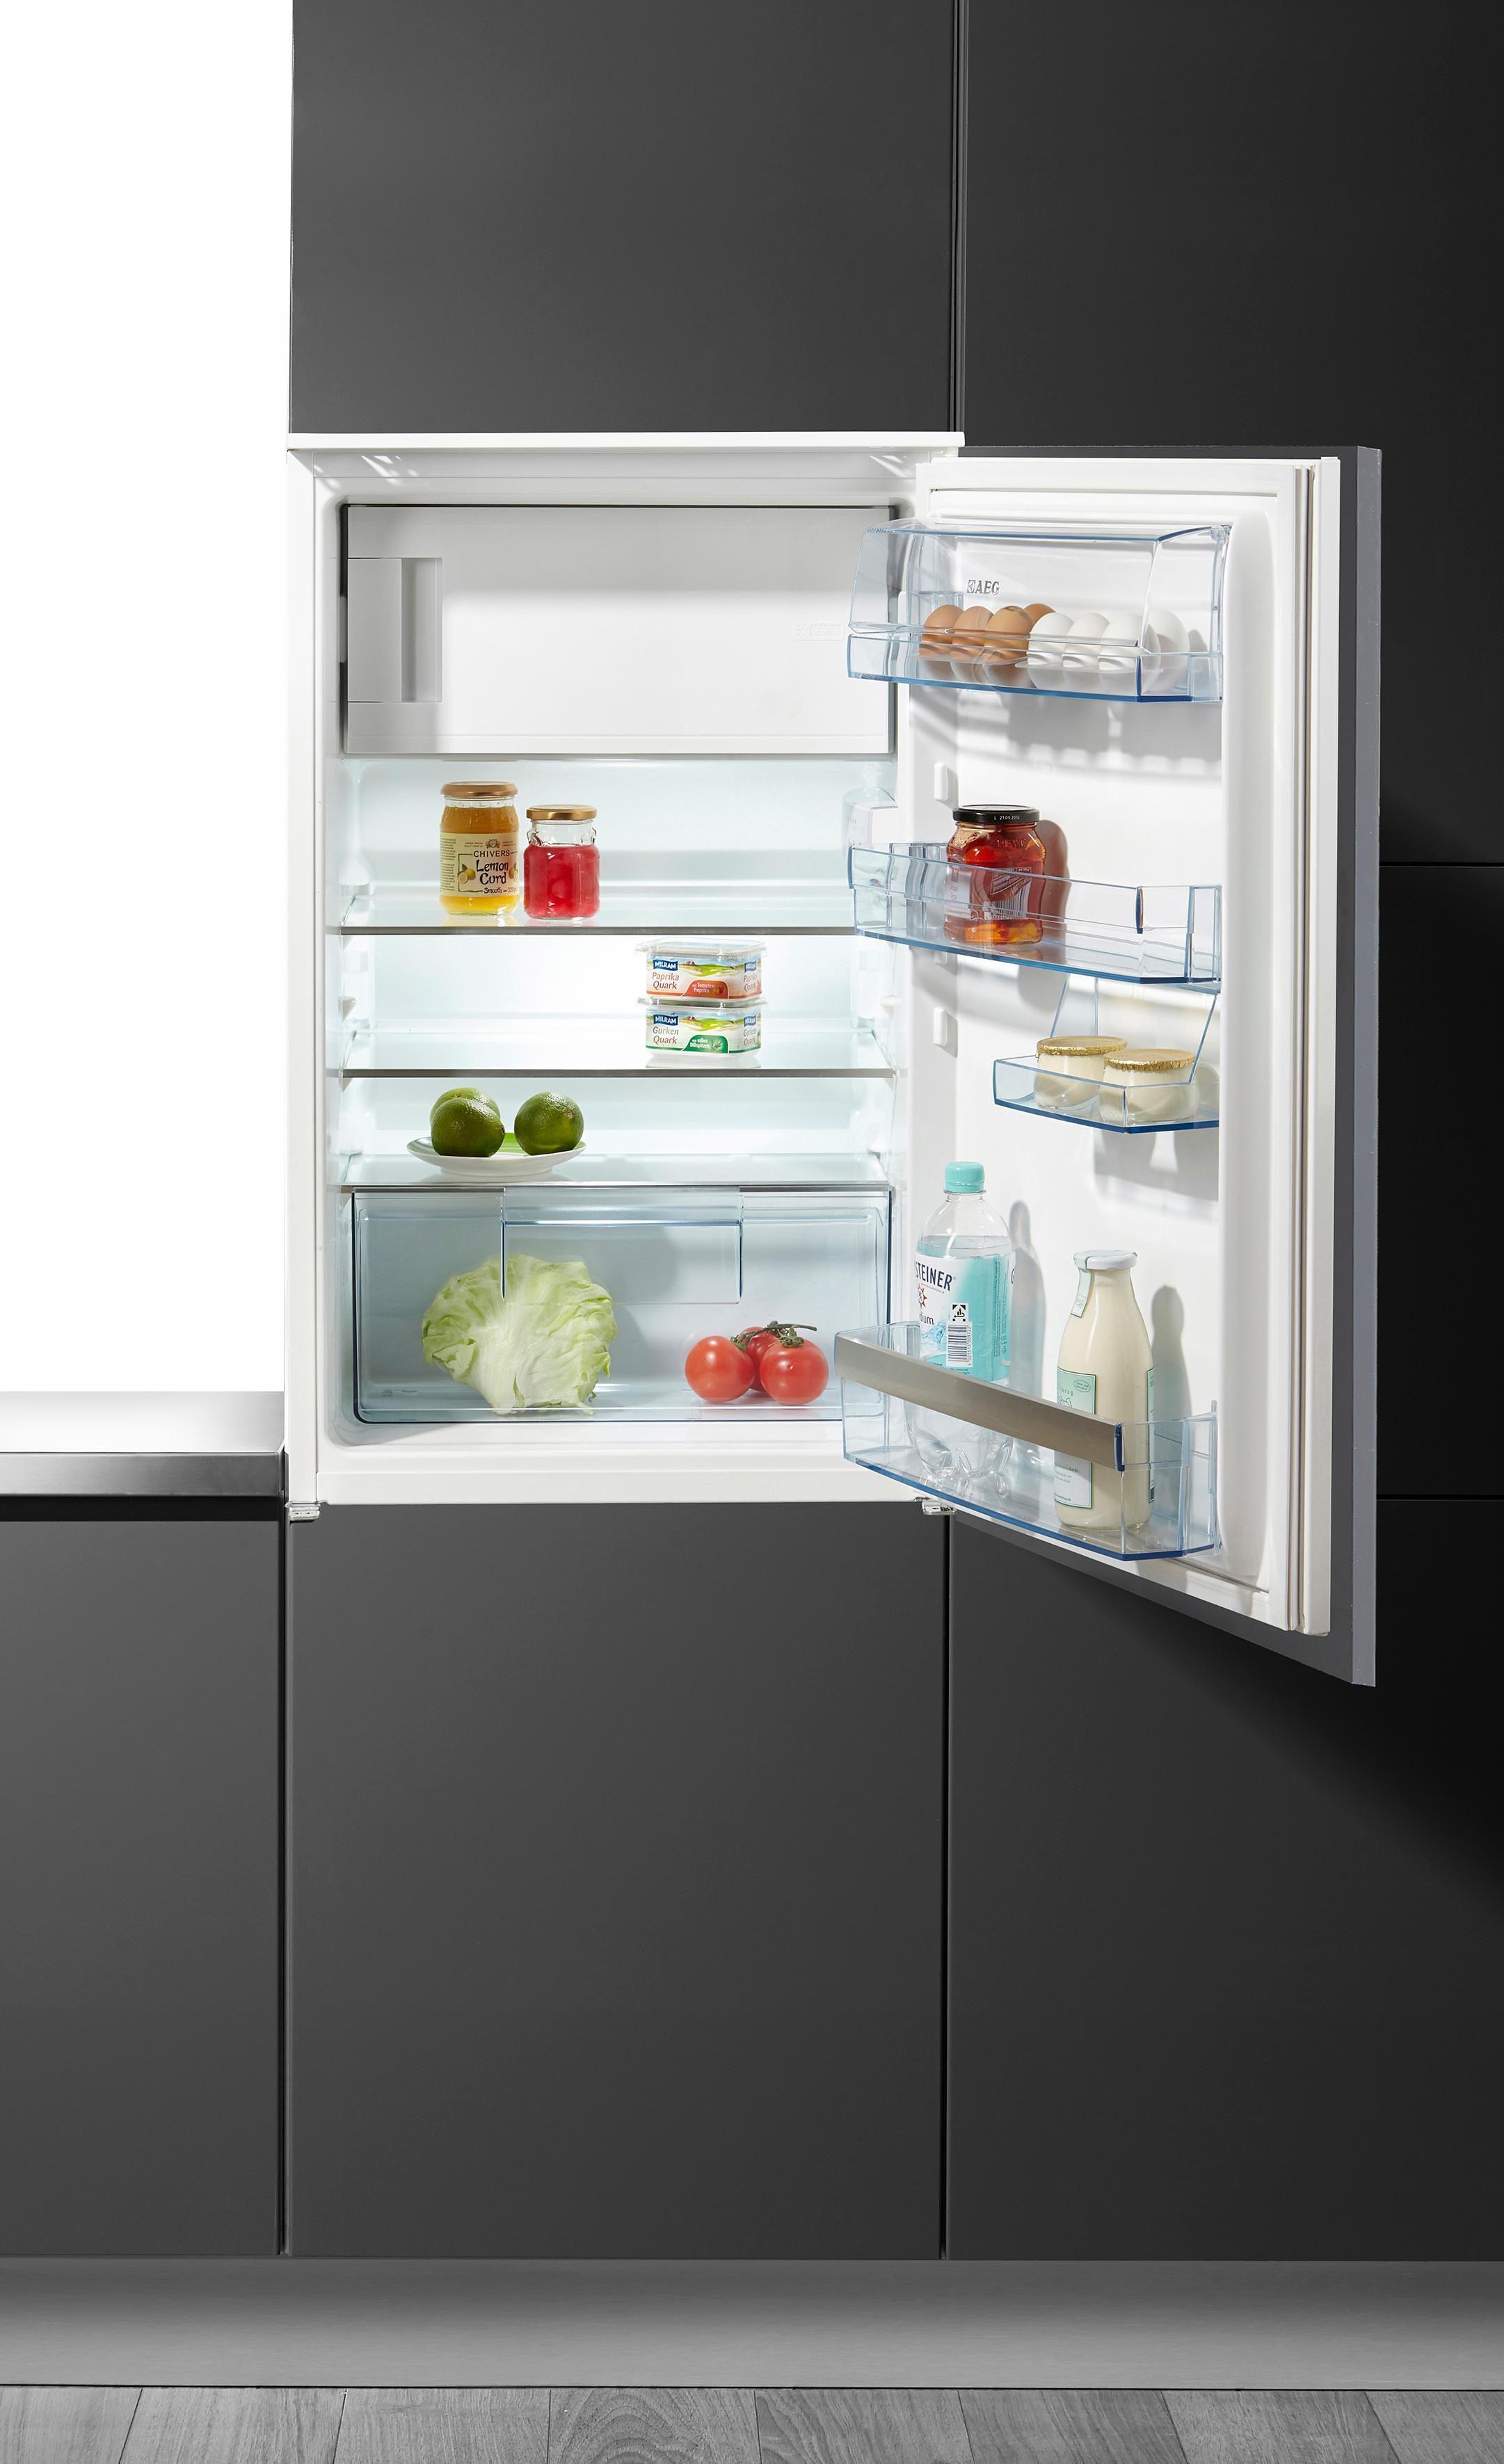 AEG Vollintegrierbarer Einbaukühlschrank S6.0S4 / SANTO, A++, 87,3 cm